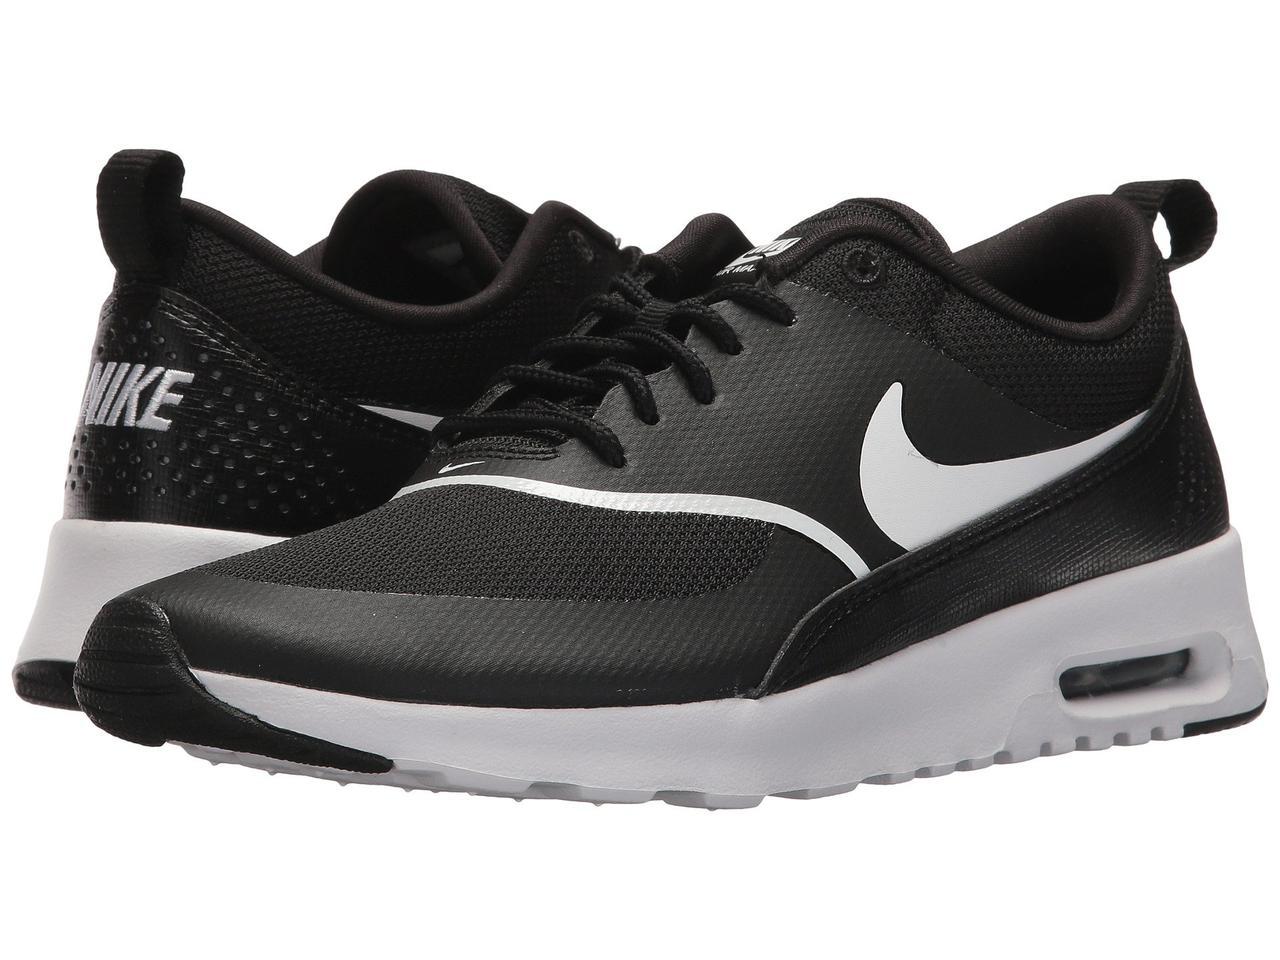 0aff3f82765b Кроссовки Кеды (Оригинал) Nike Air Max Thea Black White 2, цена 2 ...